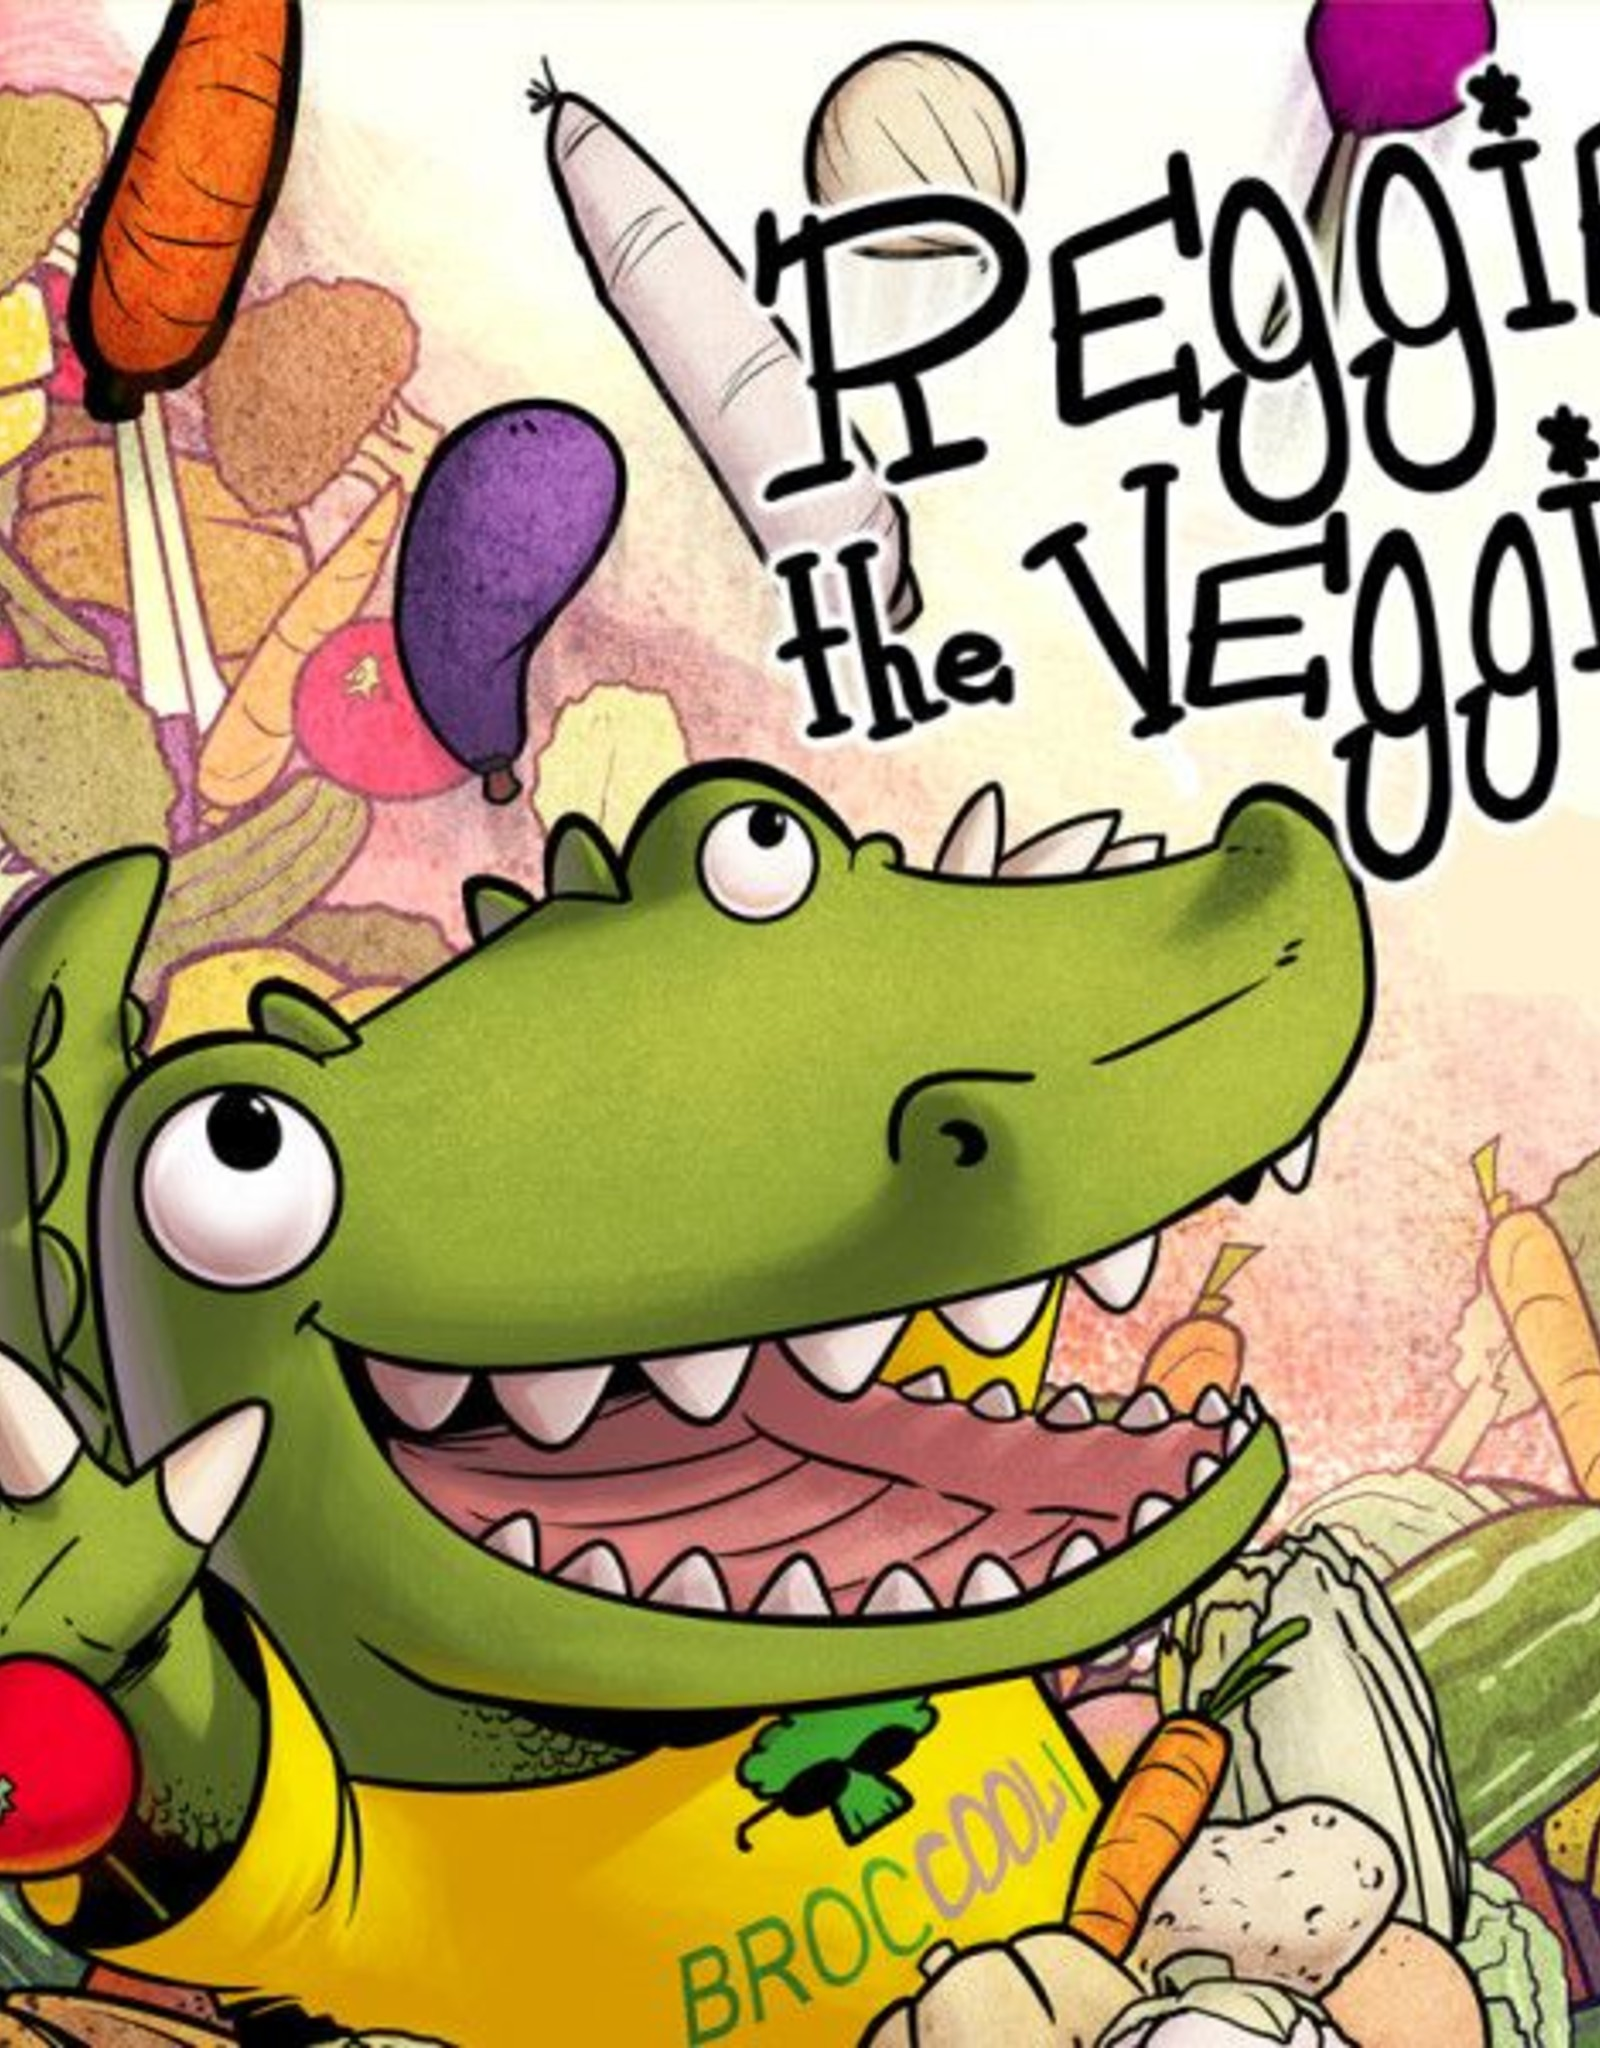 Stan Lee's Kids Universe: Reggie the Veggie